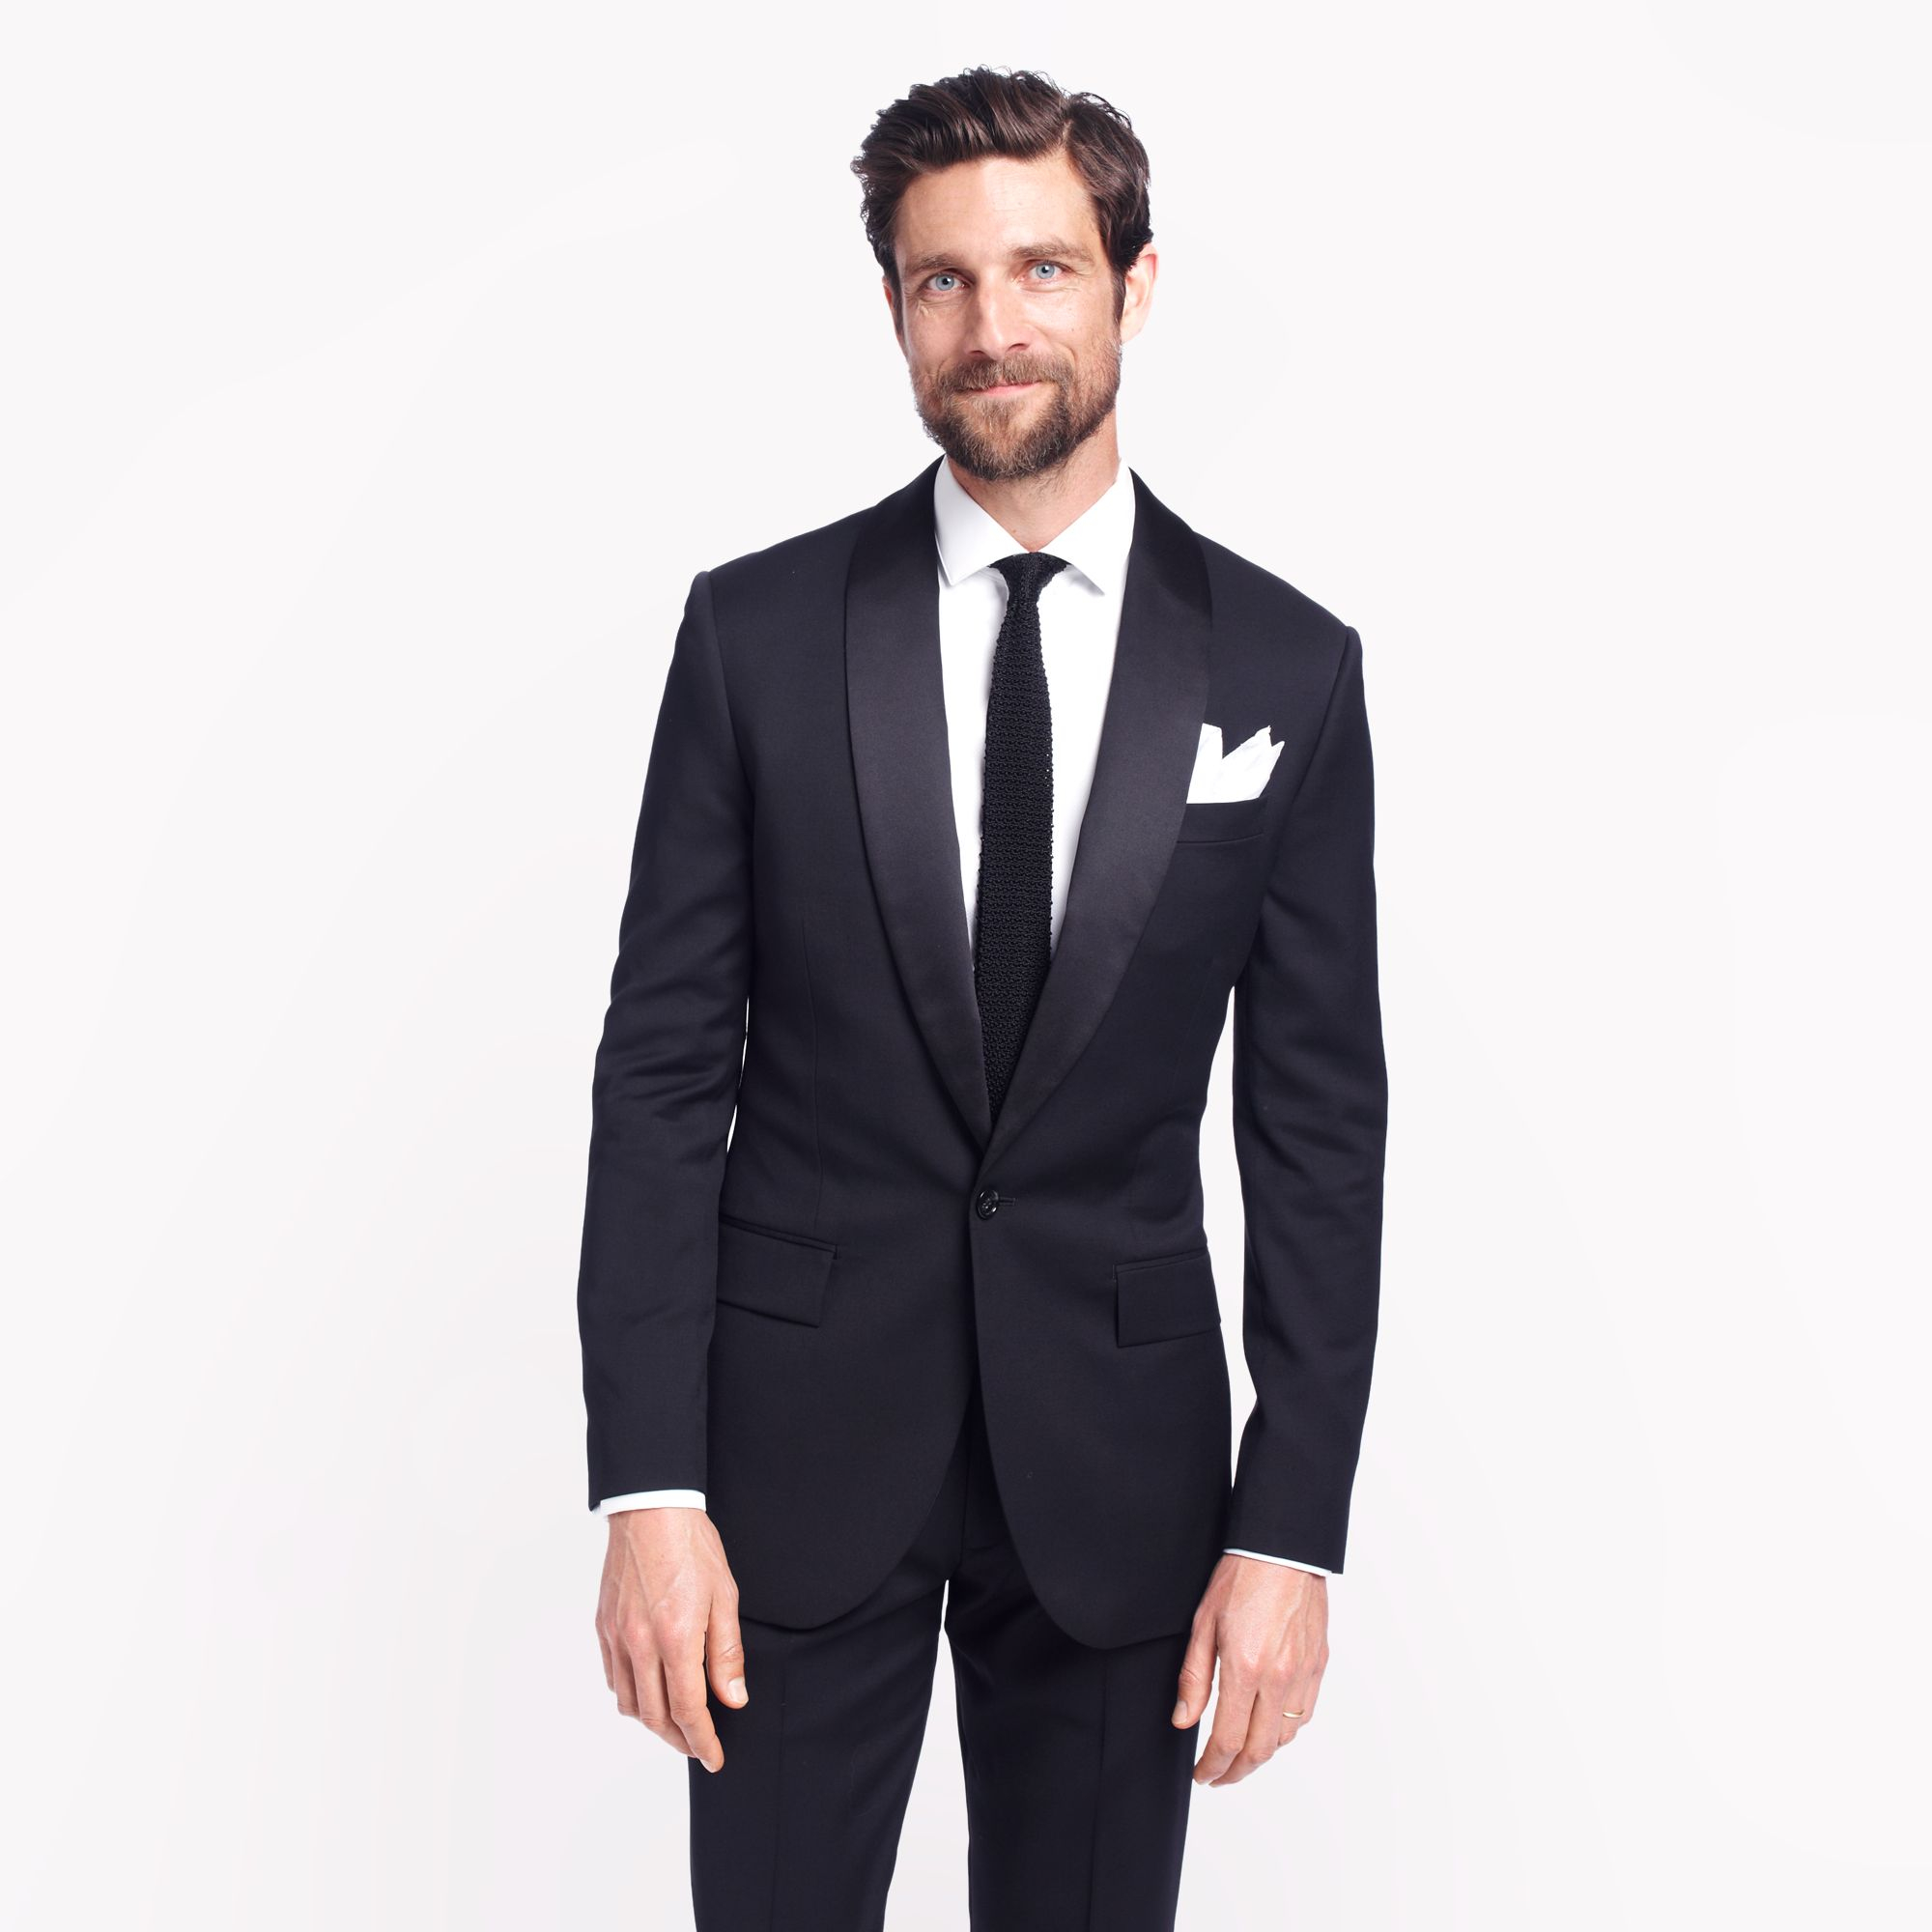 Tuxedo: J.crew Ludlow Shawl-collar Tuxedo Jacket In Italian Wool